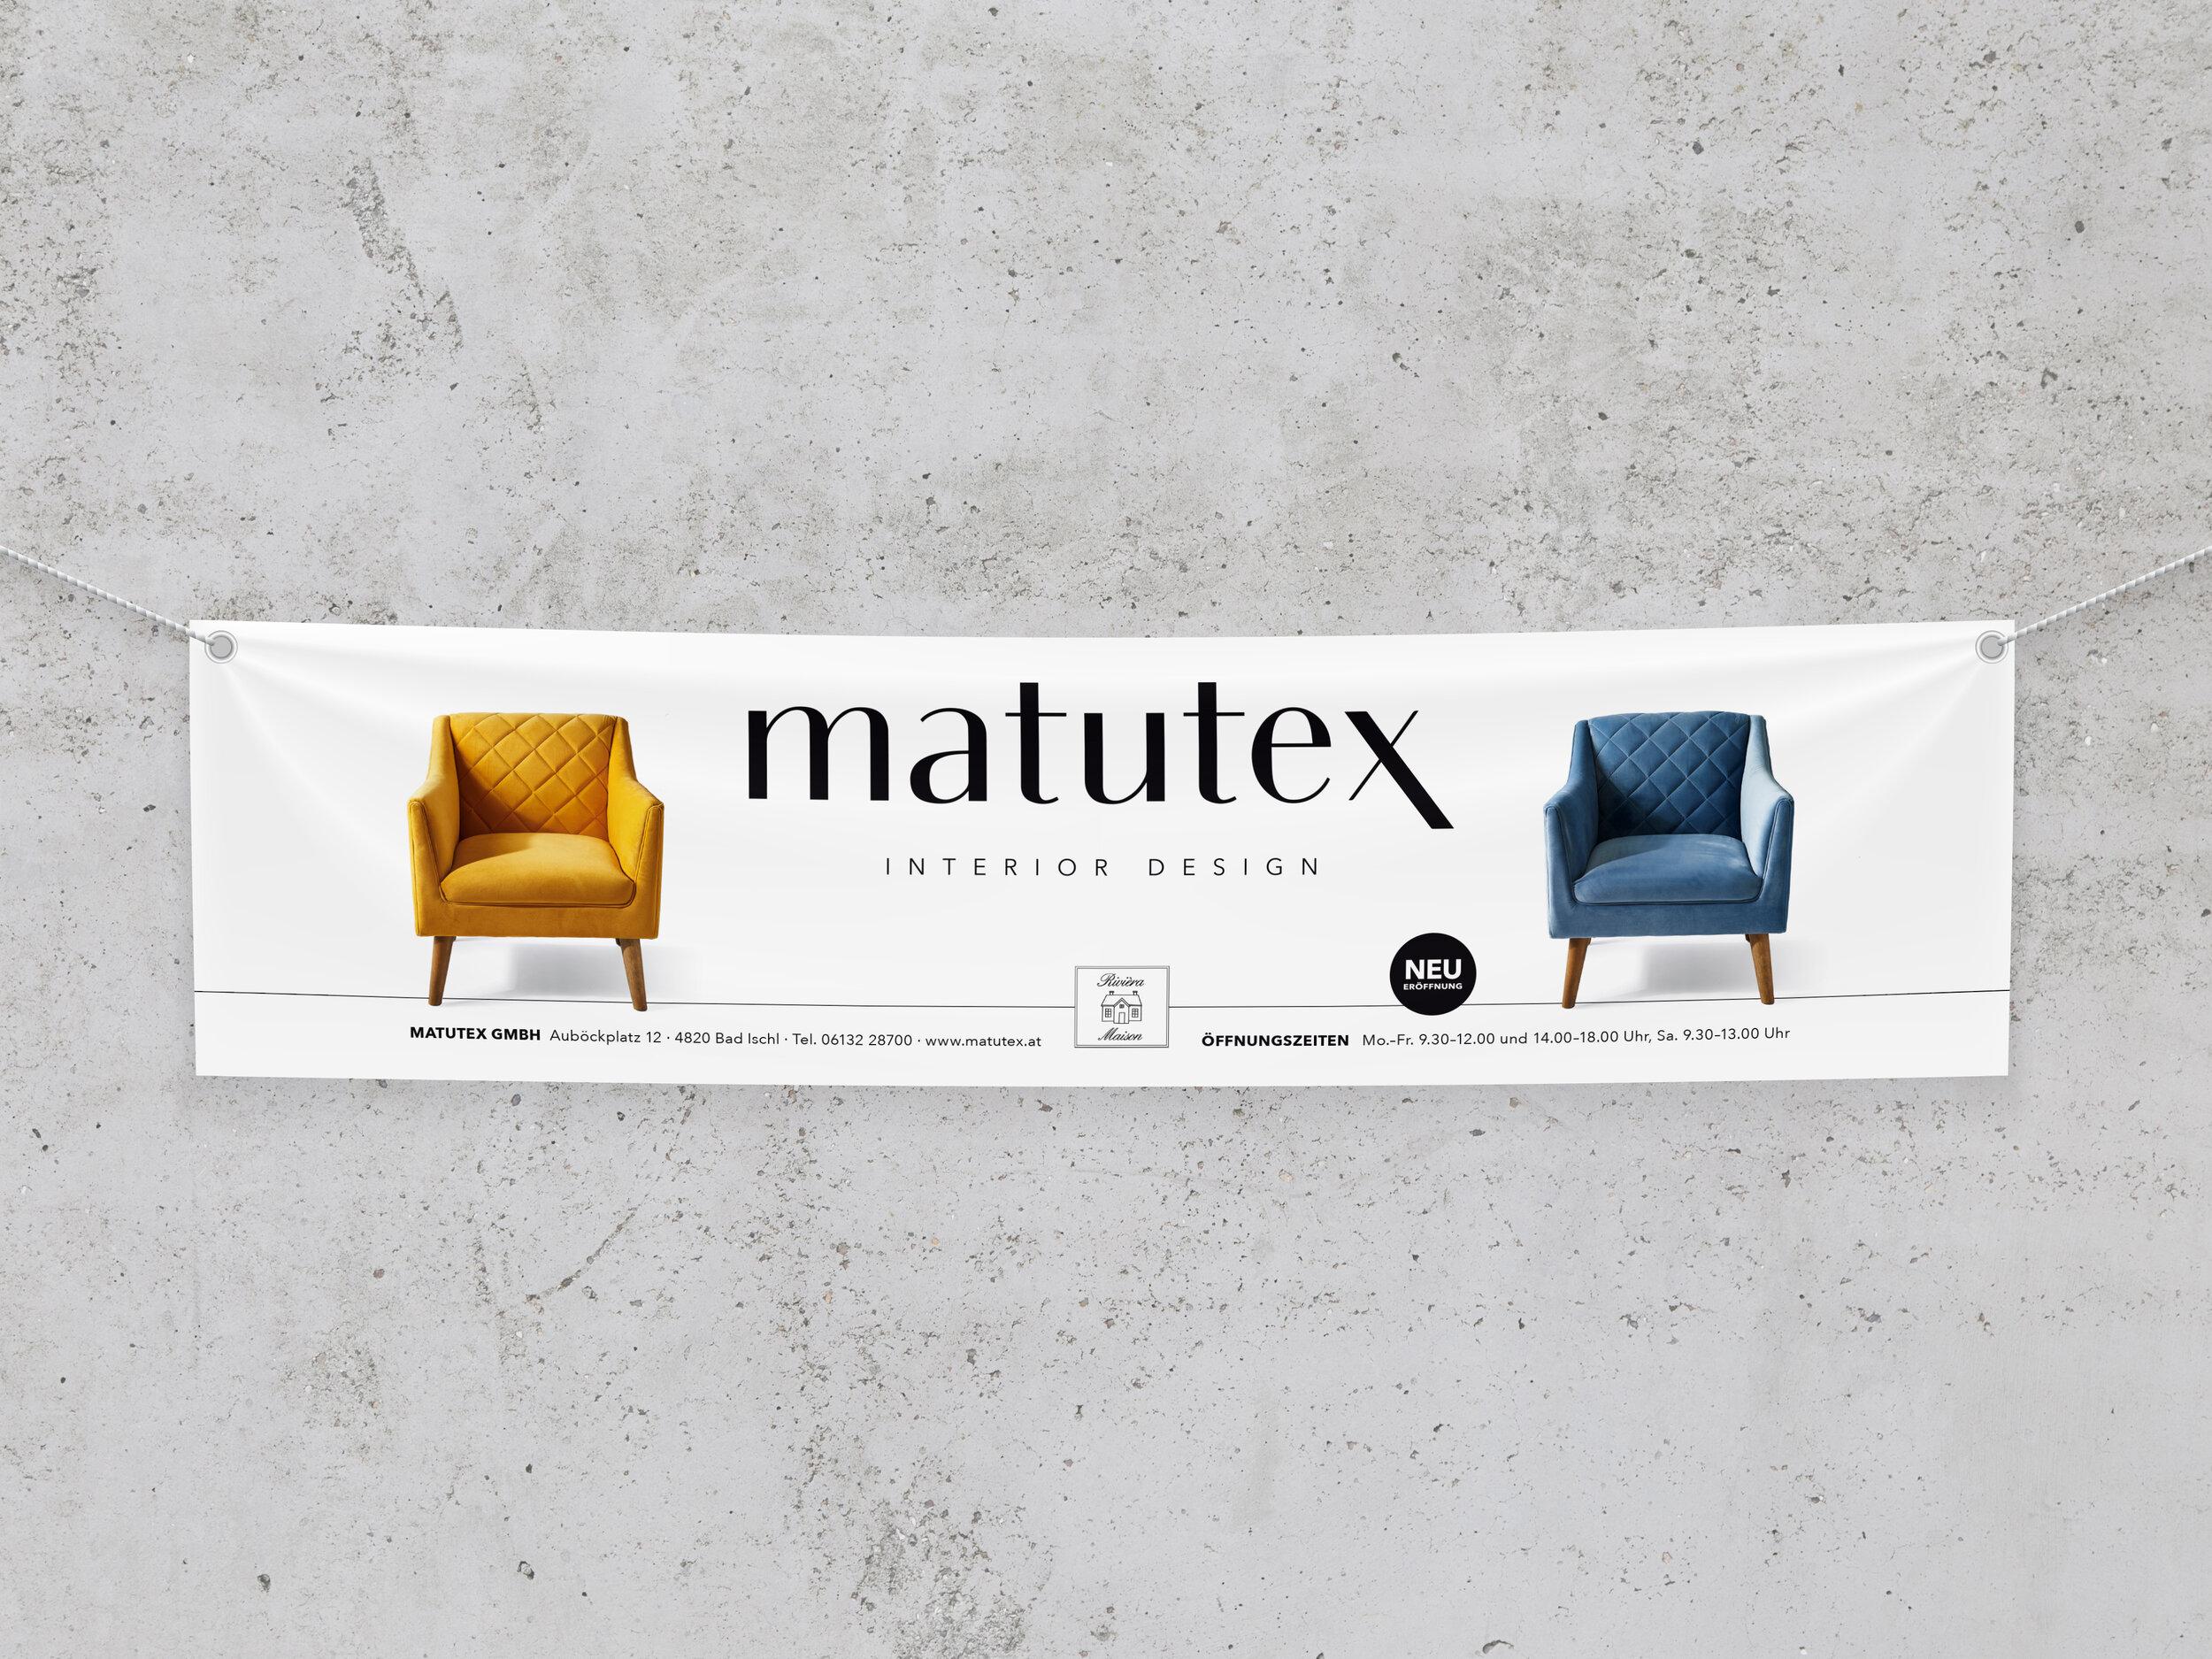 Banner Mockup_Matutwx.jpg